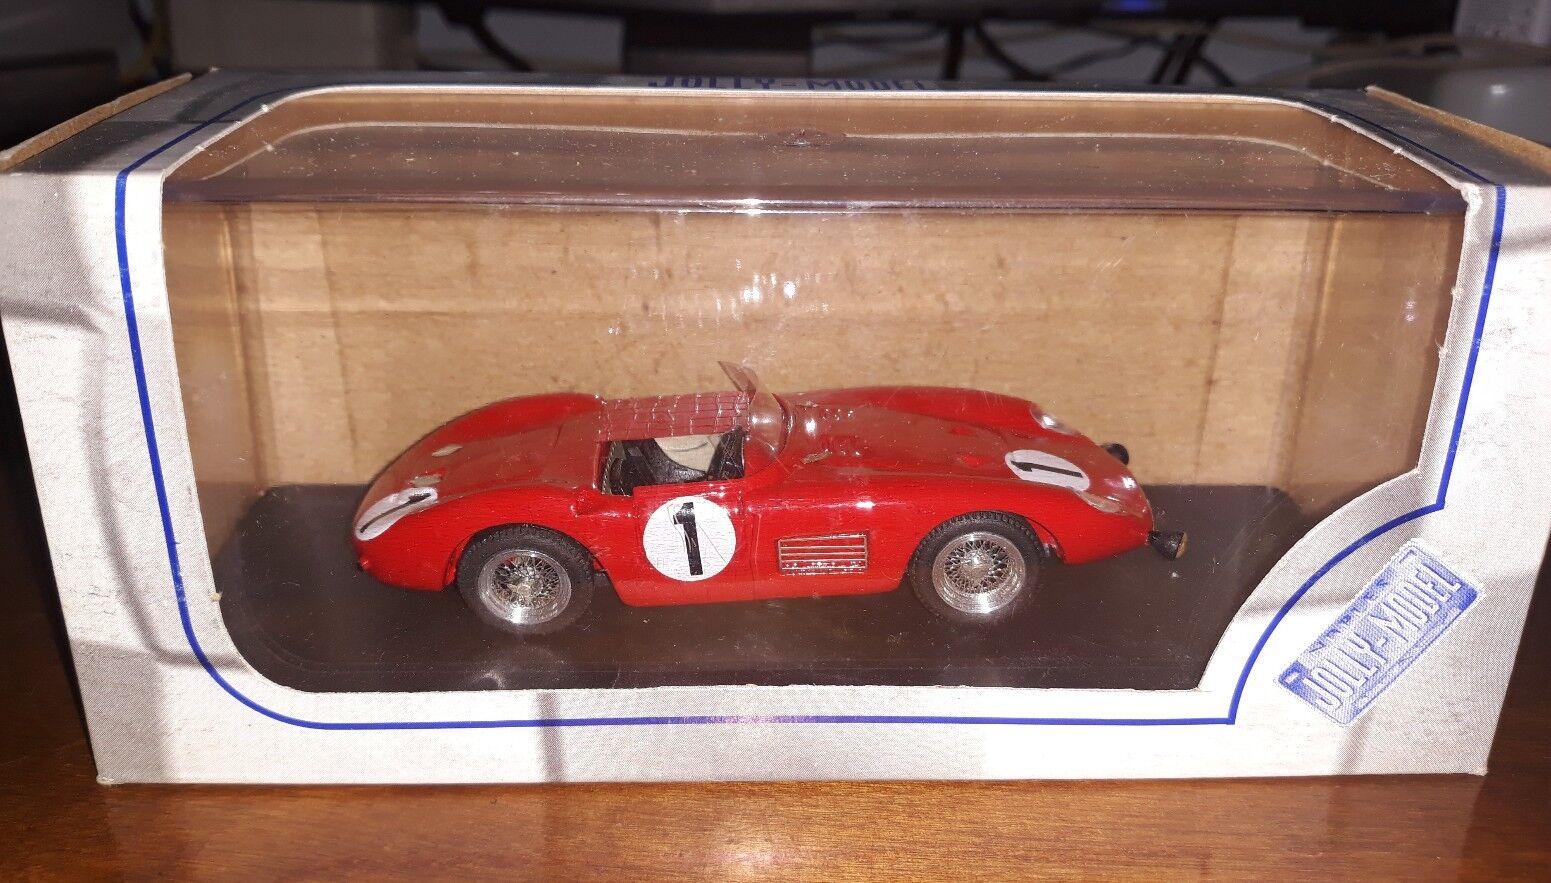 Jolly-Model  Maserati 300 S  1 Le Mans 1958 JL0114